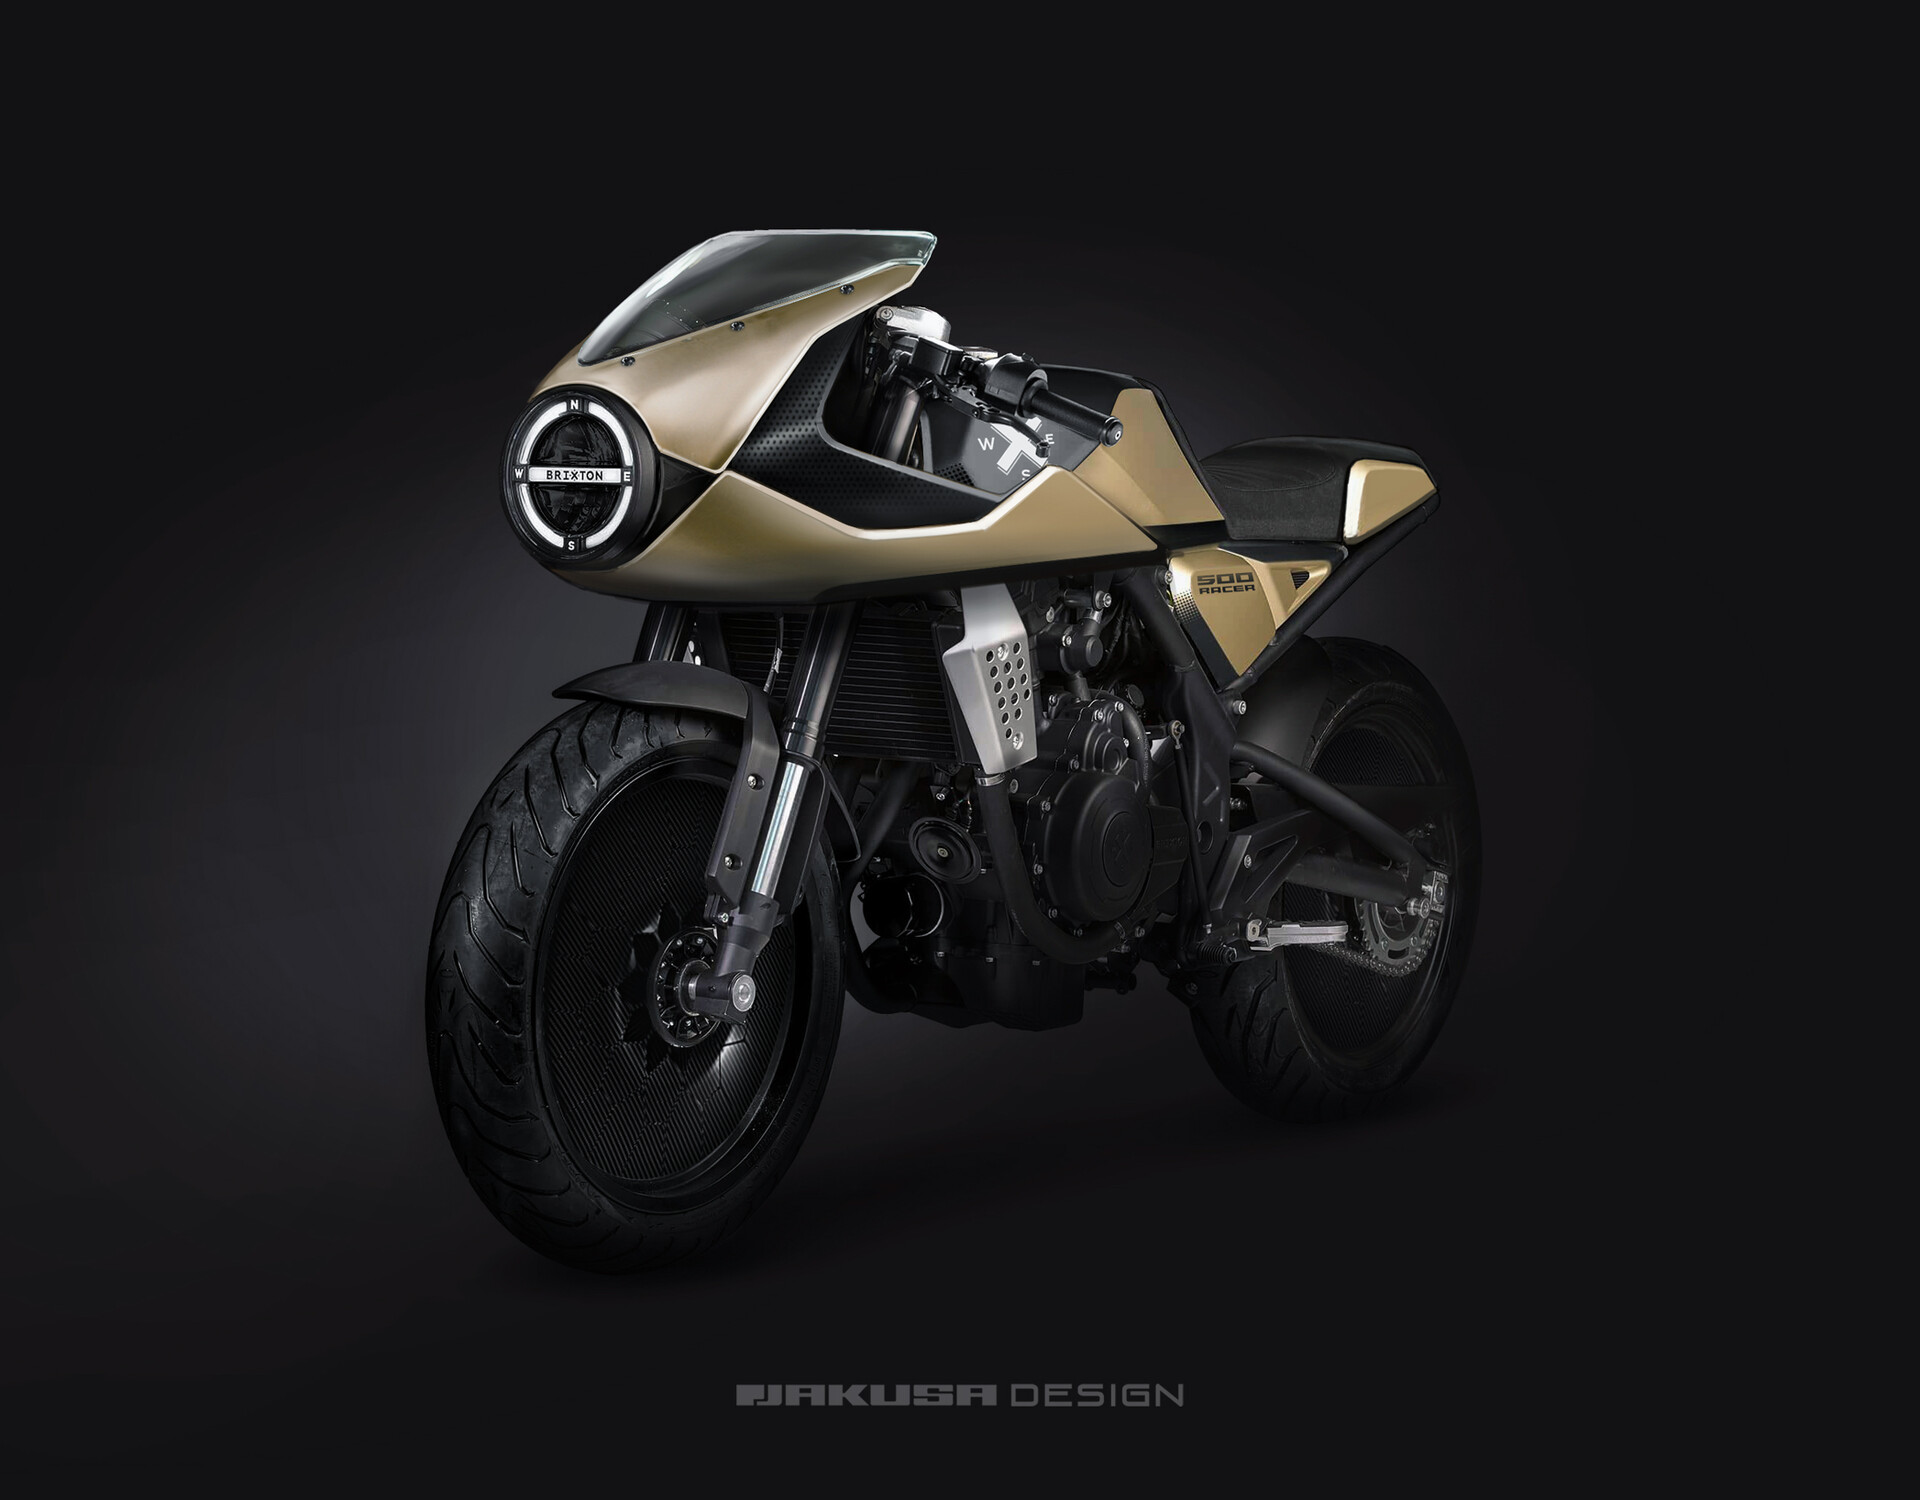 Jakusa design bx 500cc racer 2